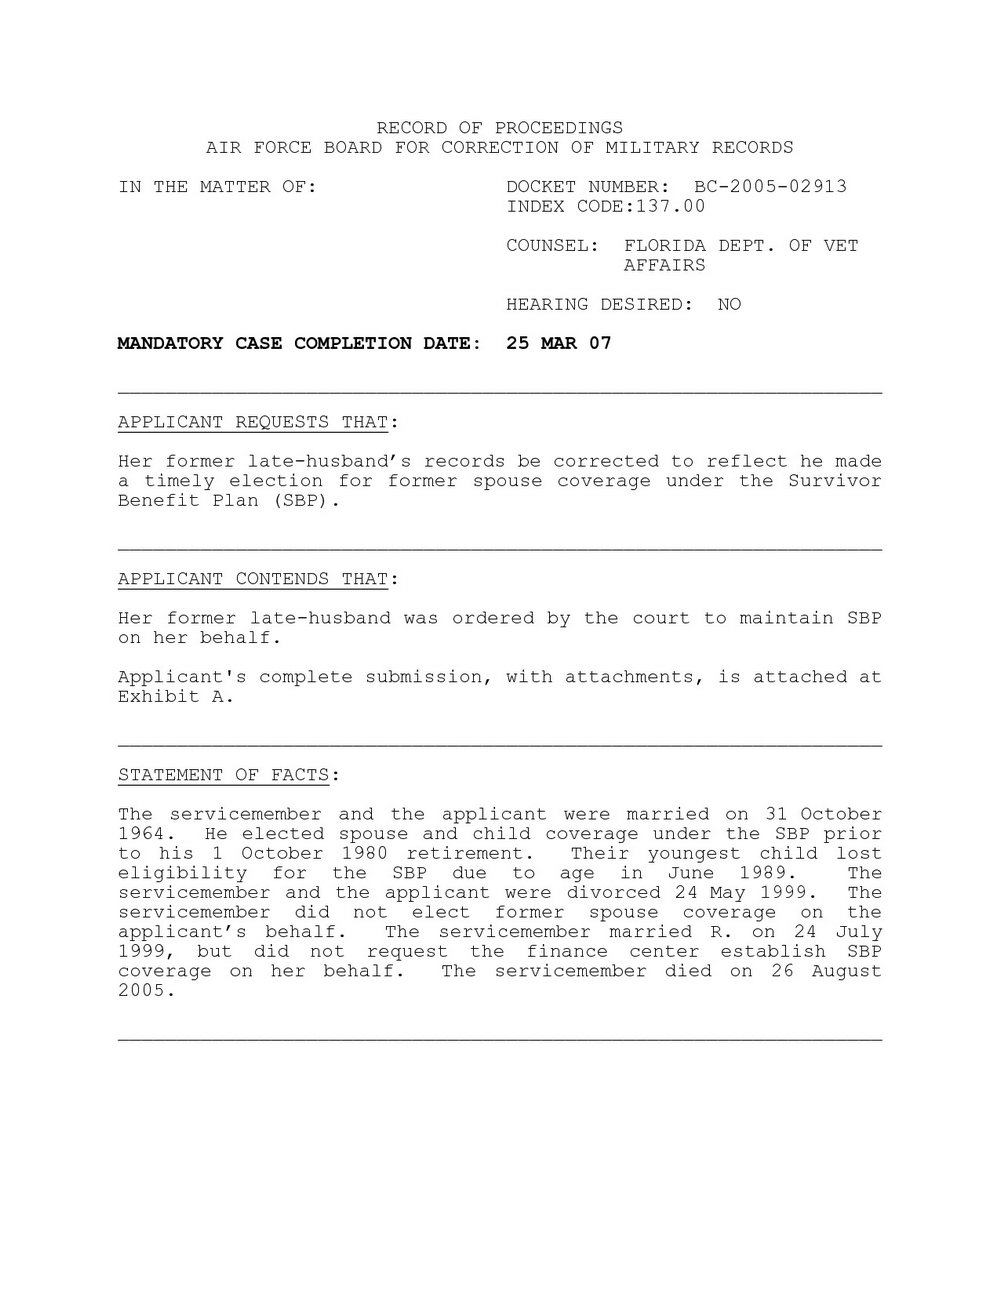 Marital Separation Agreement Form Maryland